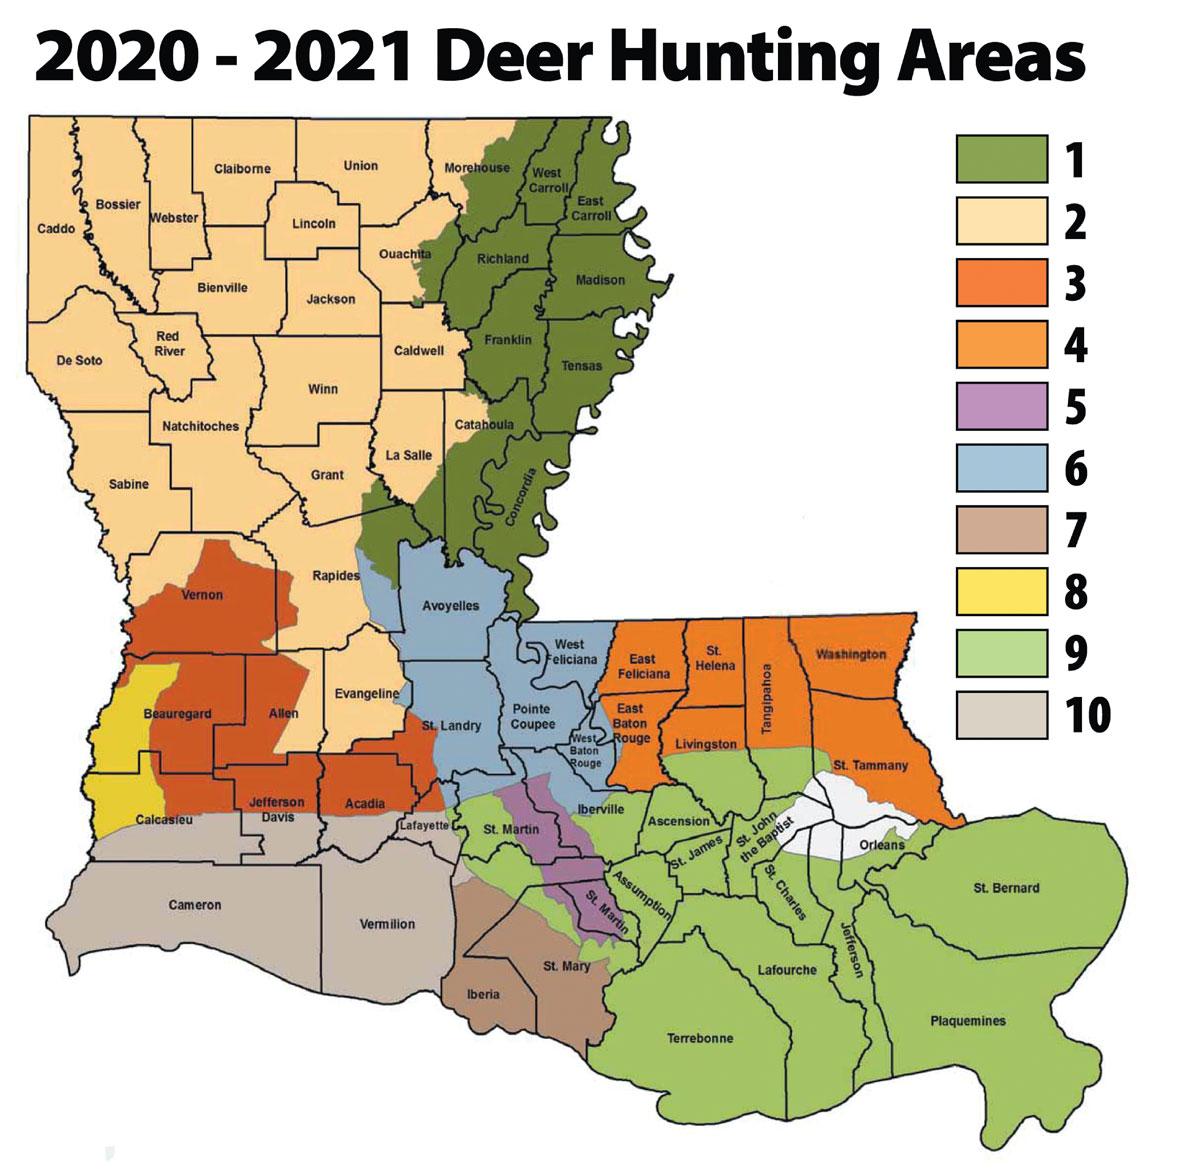 Louisiana'S 2020 Rut Report - Louisiana Sportsman in Deer Hunting Calendar 2021